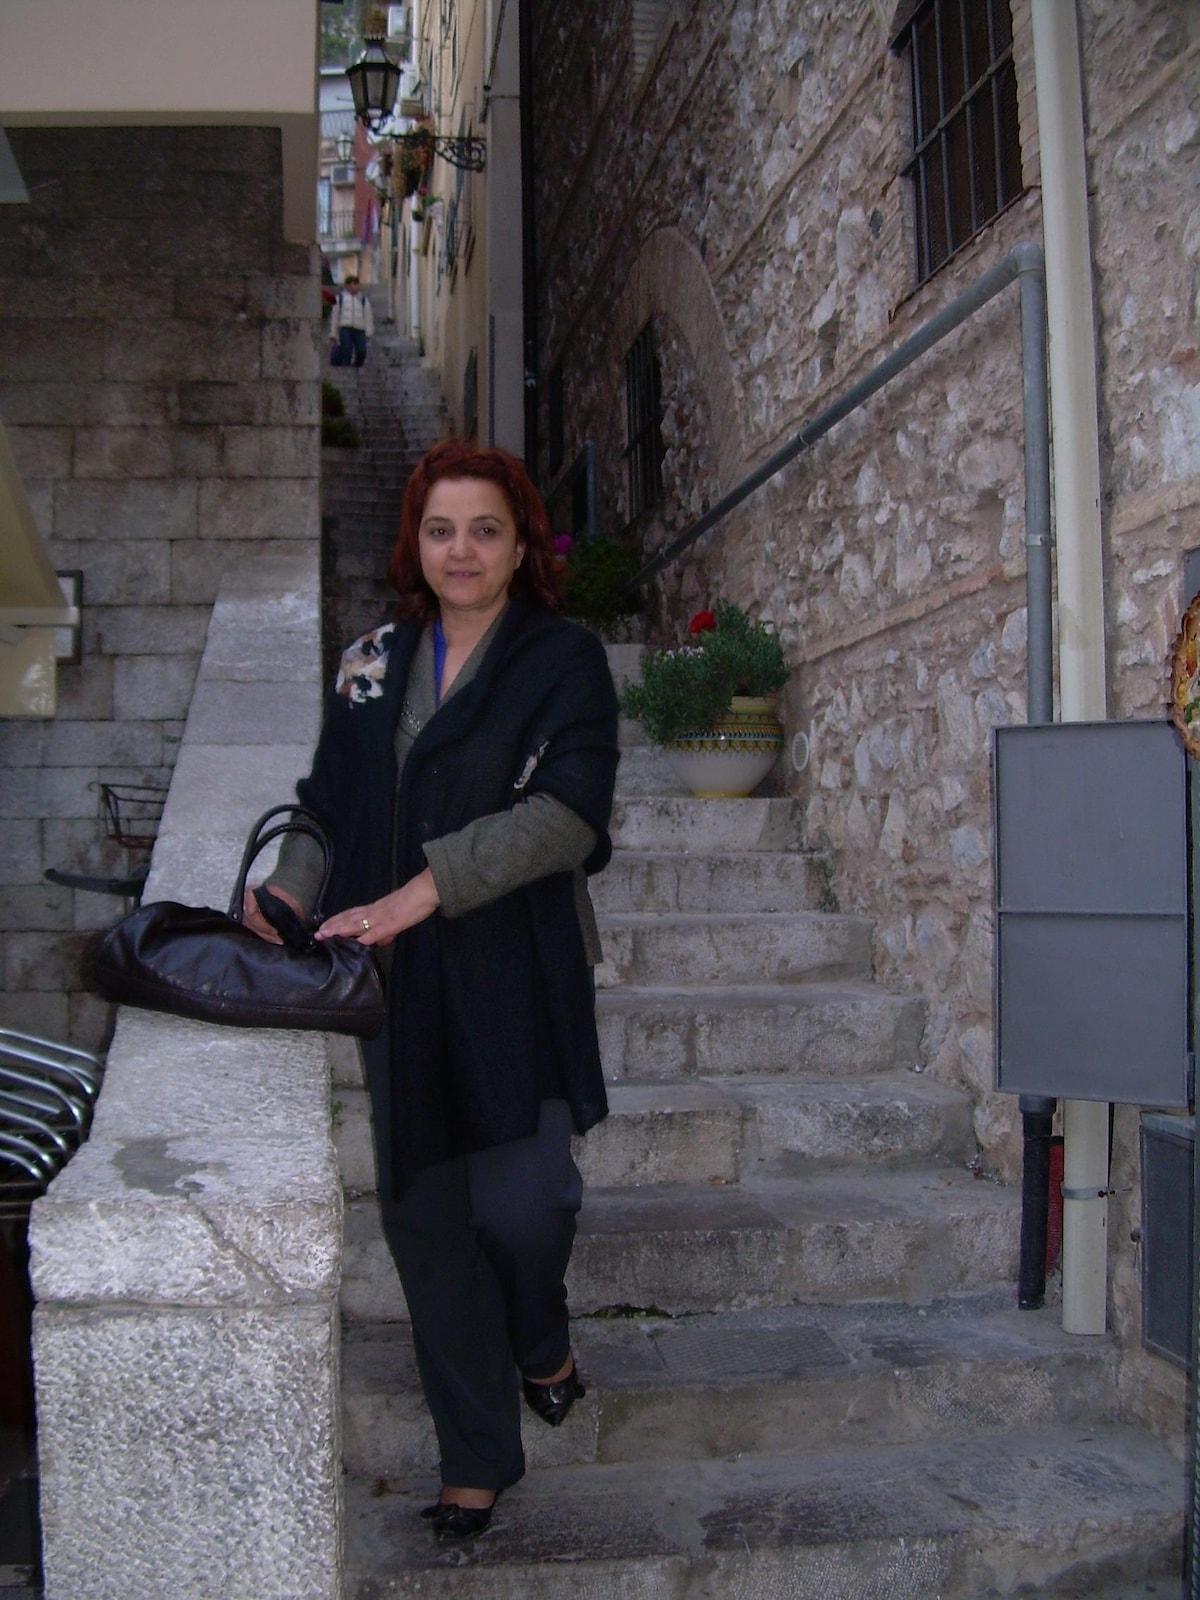 Francesca from Roseto Capo Spulico